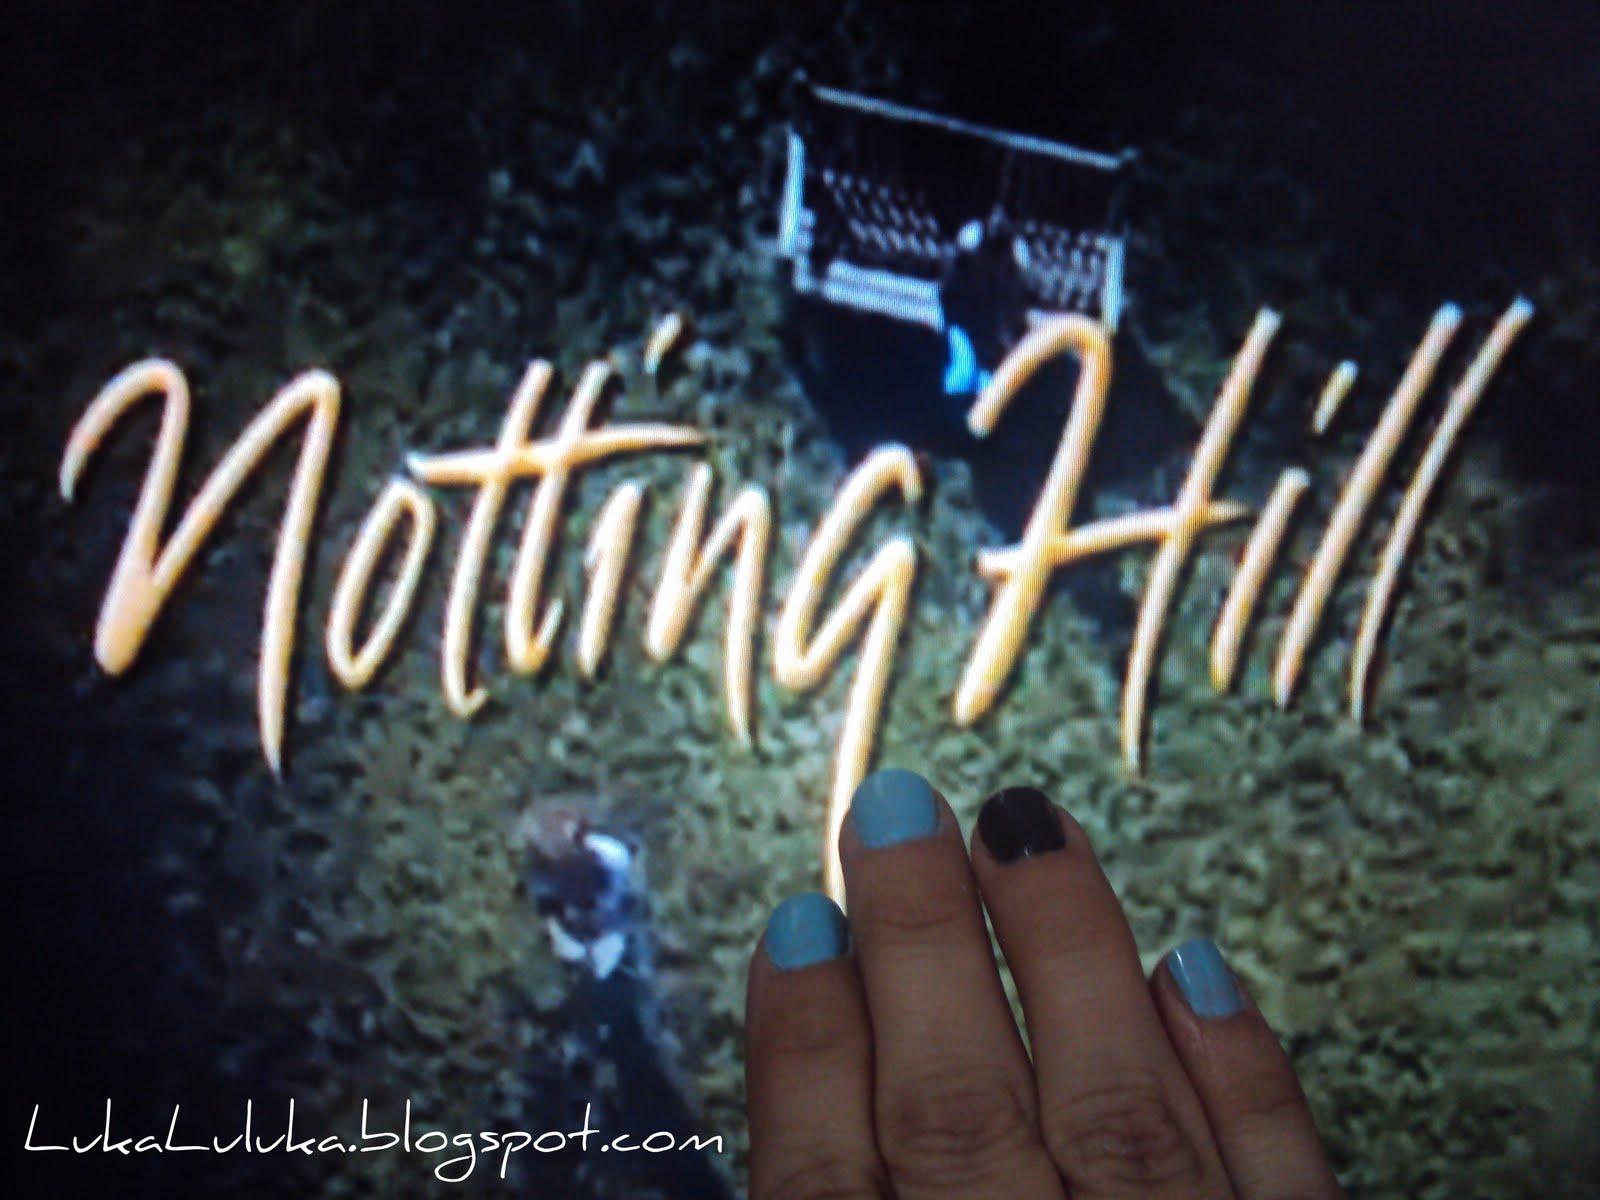 http://3.bp.blogspot.com/-K5d0RCkopGg/TisgymFzD-I/AAAAAAAAAdM/82dCJoLQTVk/s1600/Luka+Luluka+-+esmalte+%252B+notting+hill_.jpg